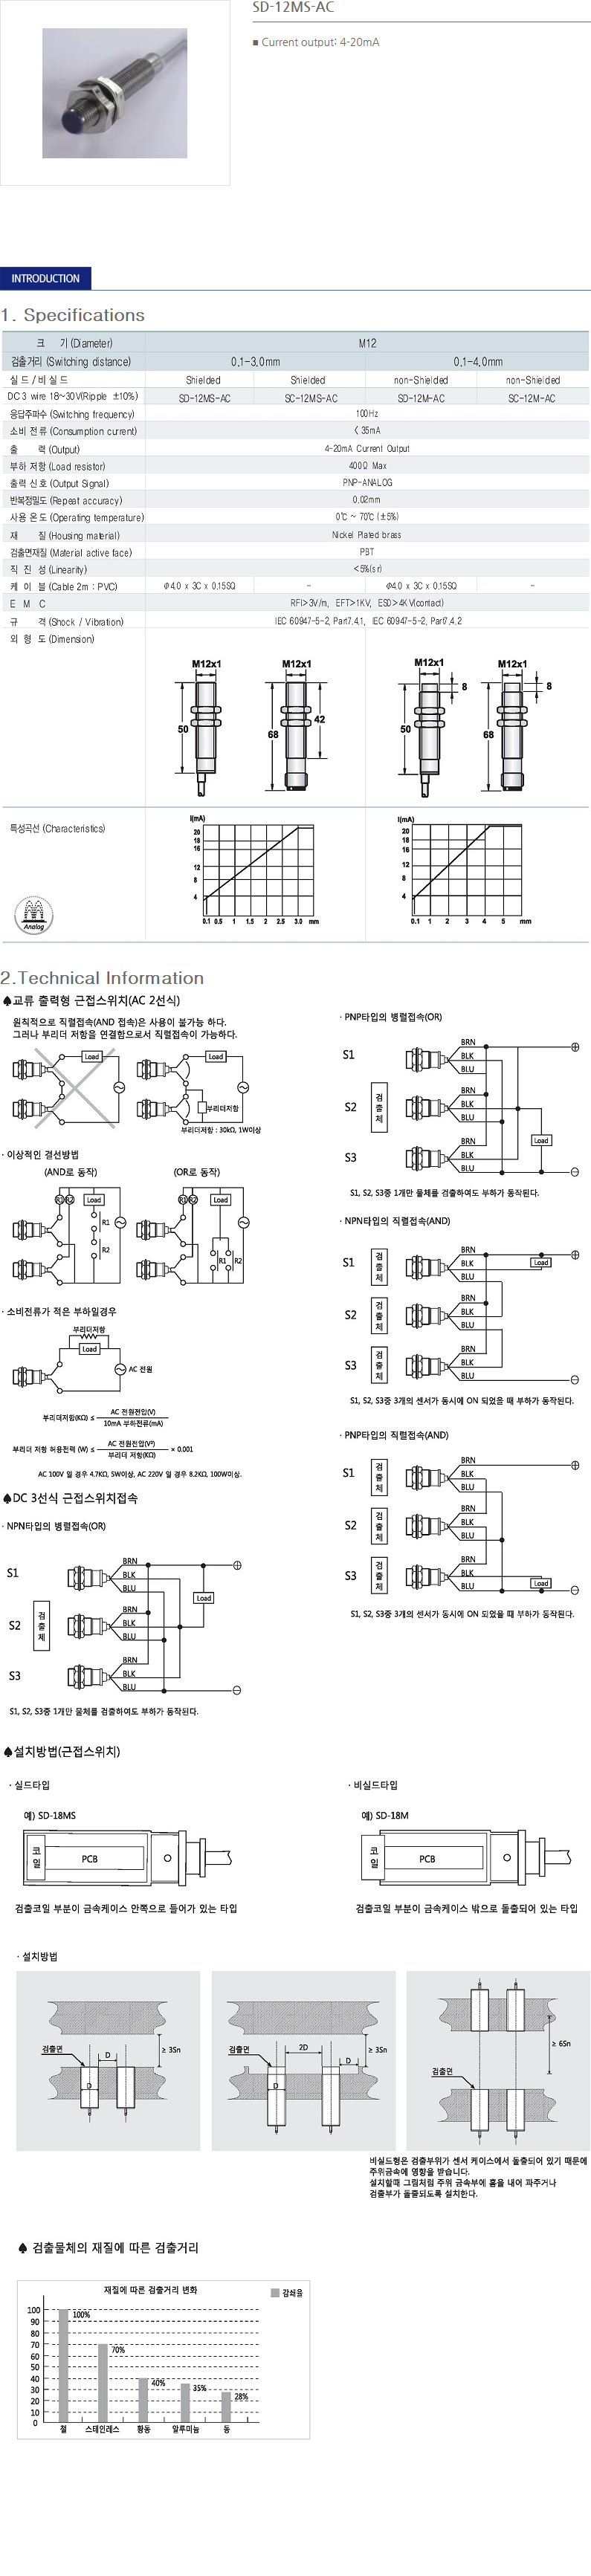 SANIL DC Analog Type Proximity Sensor  11